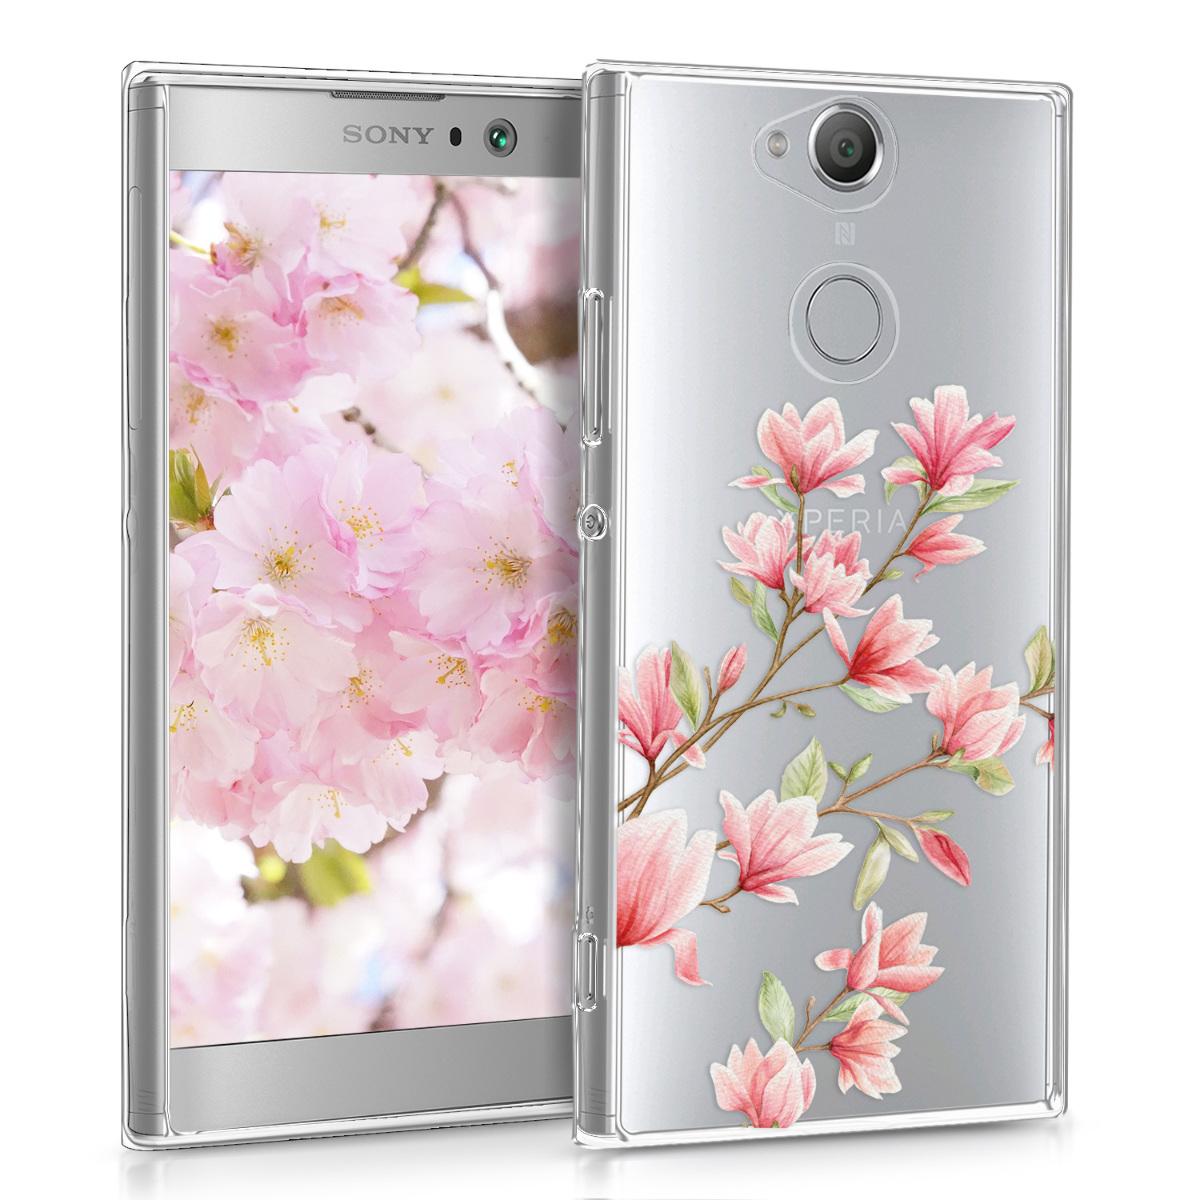 KW Θήκη Σιλικόνης Sony Xperia XA2 - Διάφανη- Σχέδιο λουλουδιών (44297.07)